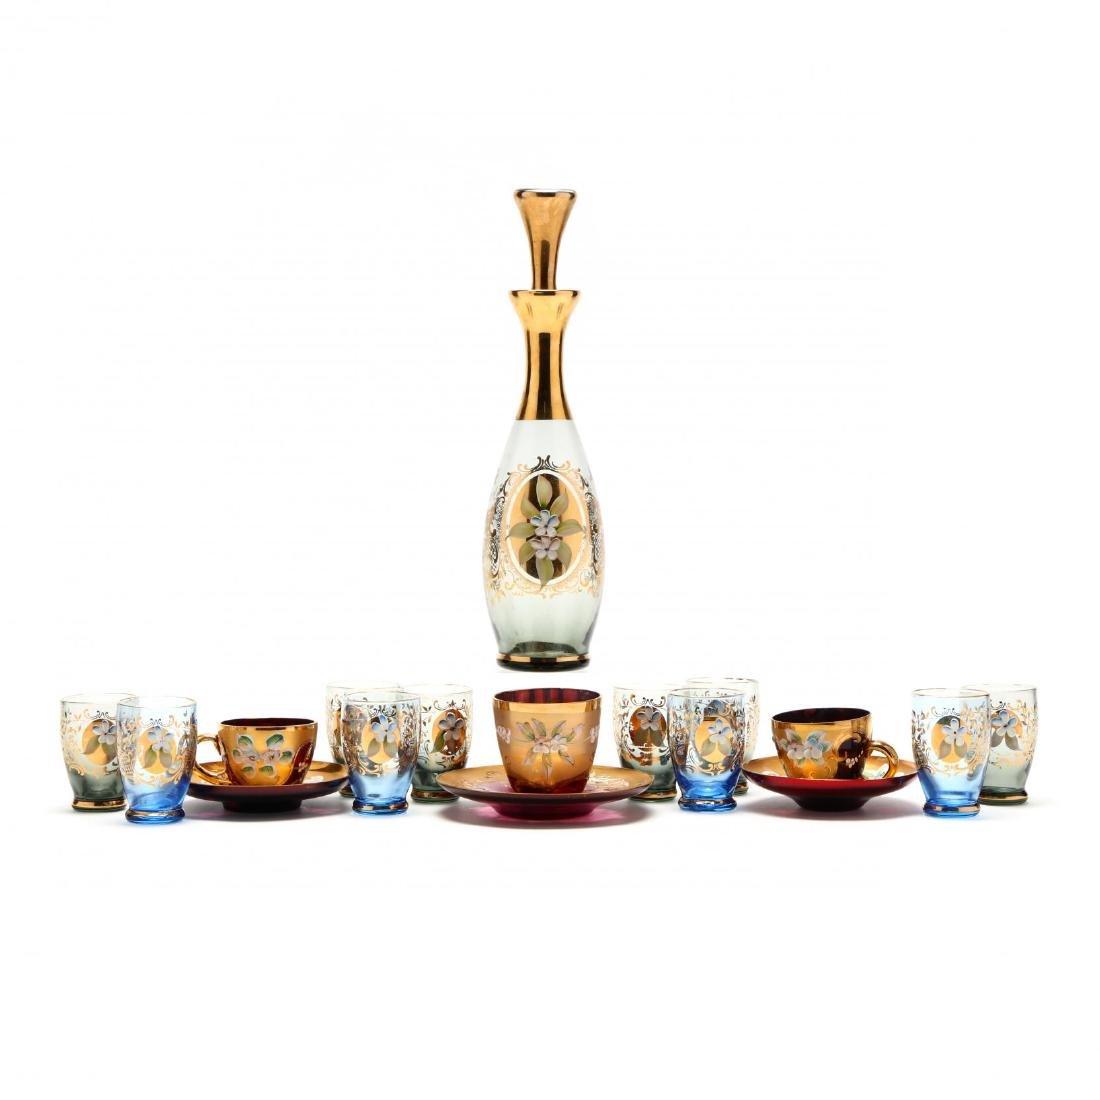 18 Pieces of Vintage Venetian Glass